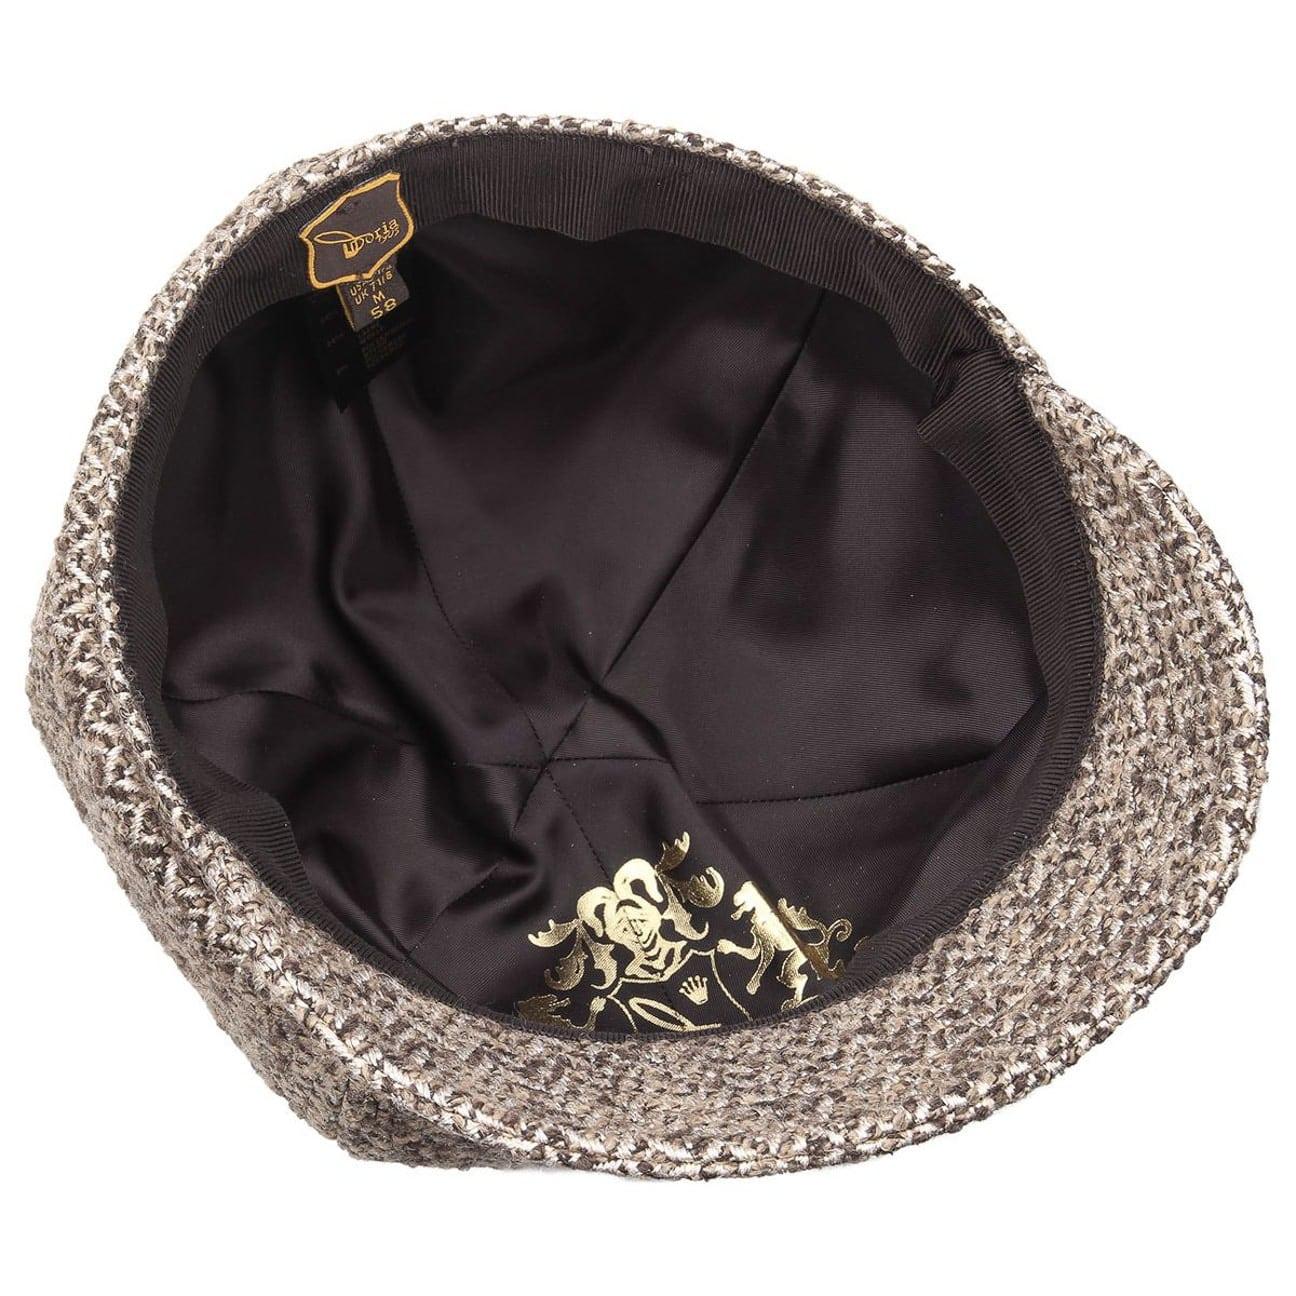 88e401616c1 Kasita newsboy cap doria hats caps beanies shop jpg 1296x1296 Doria wool newsboy  hats